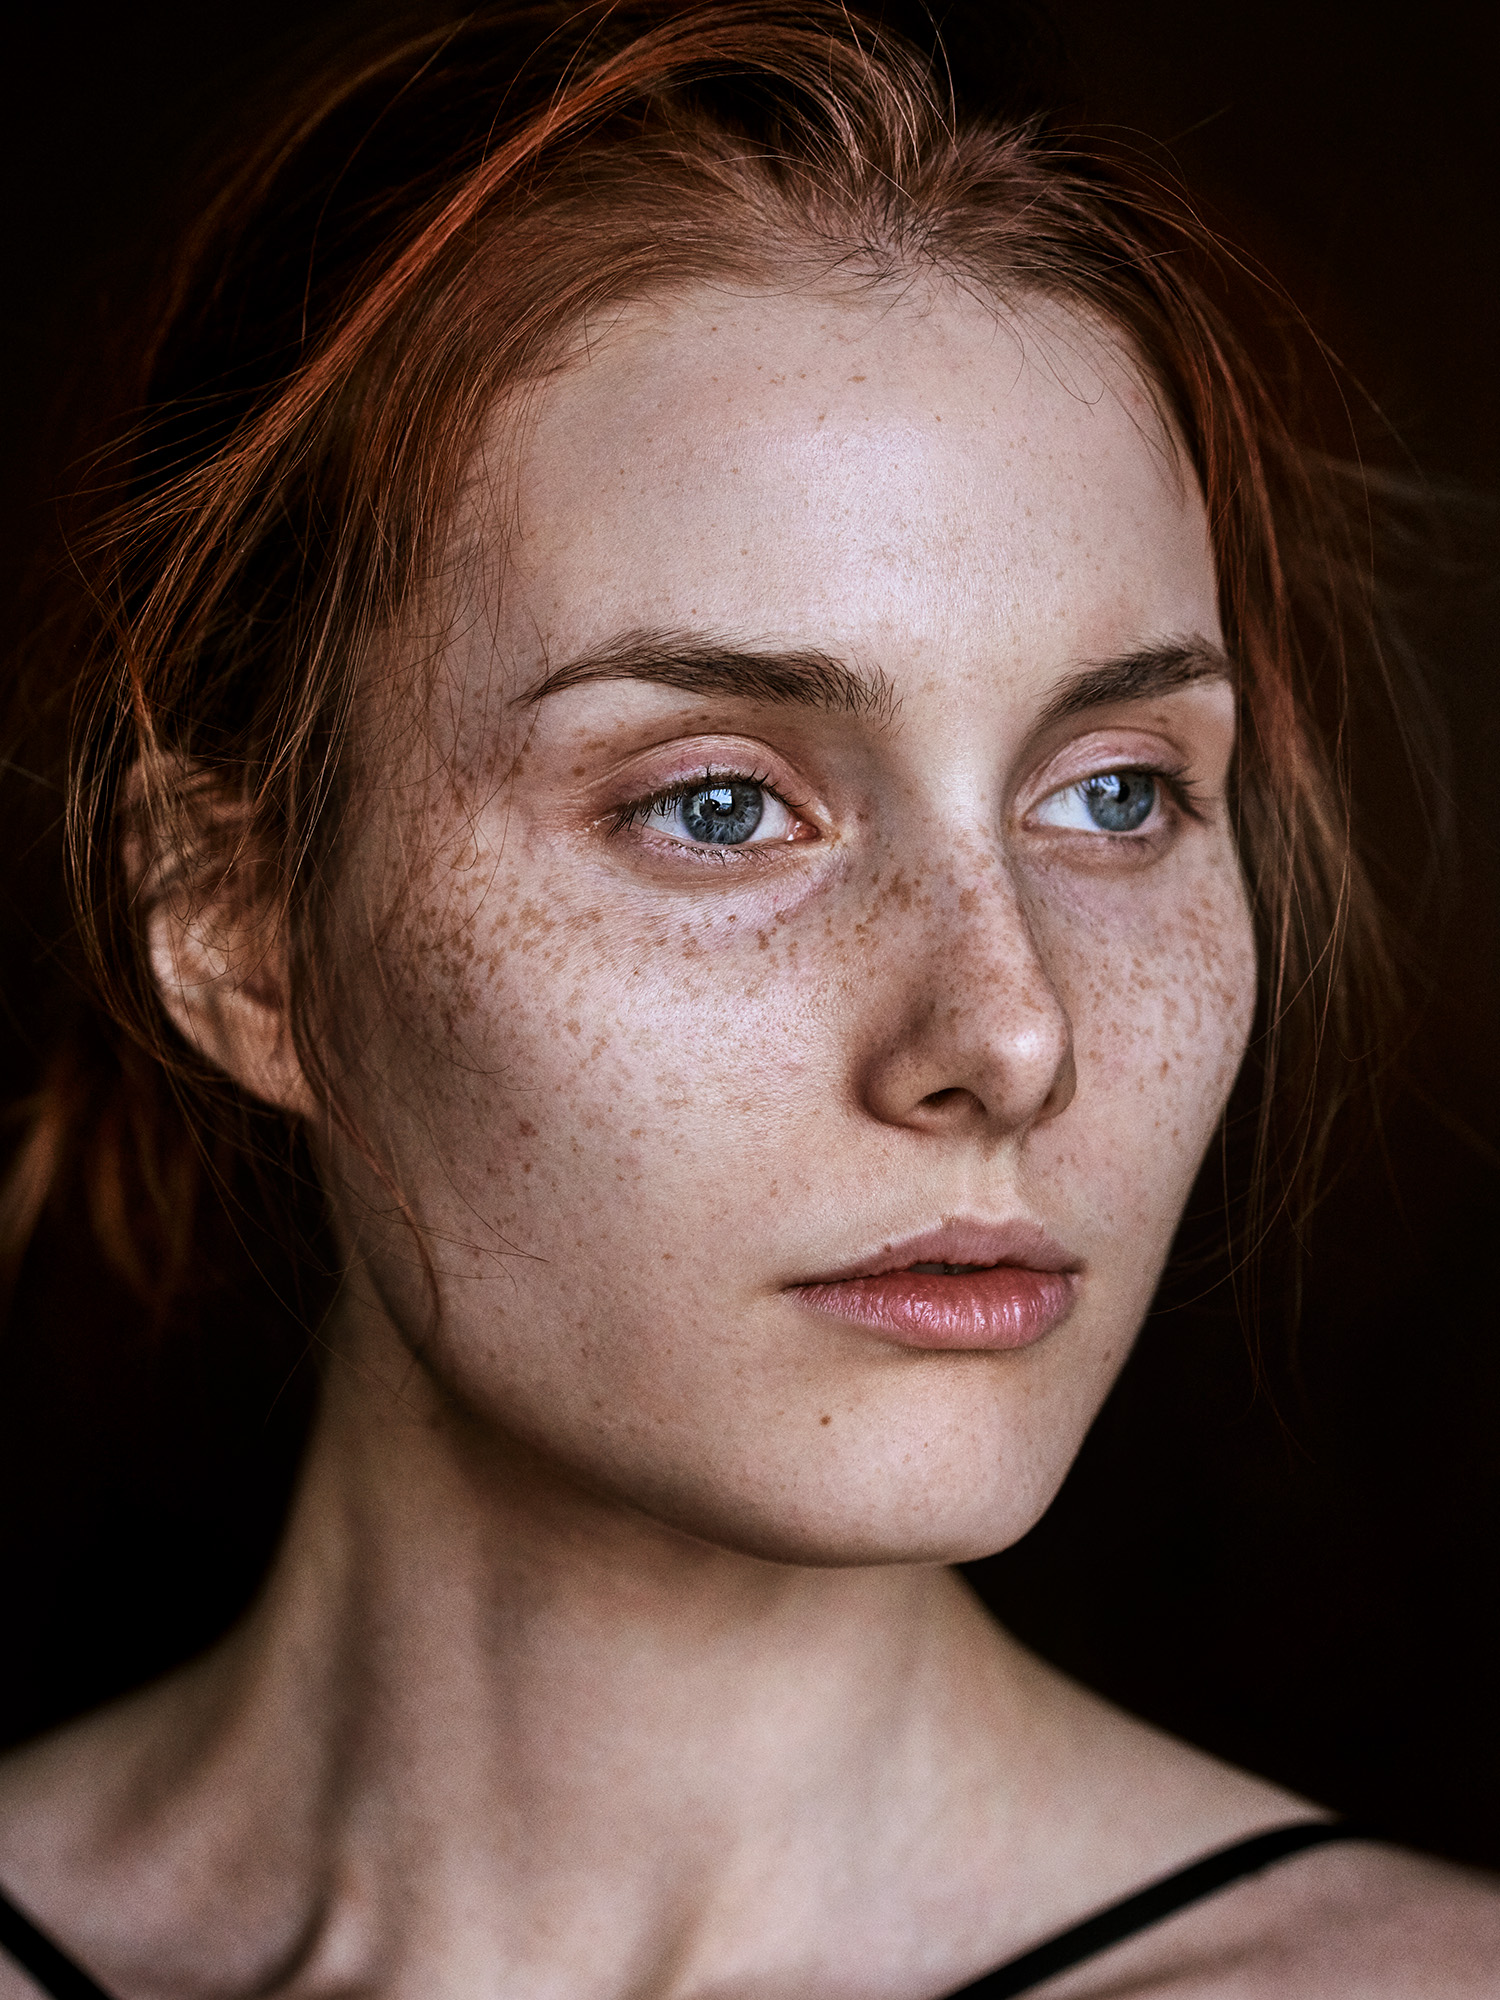 Photographer Manuel Pandalis